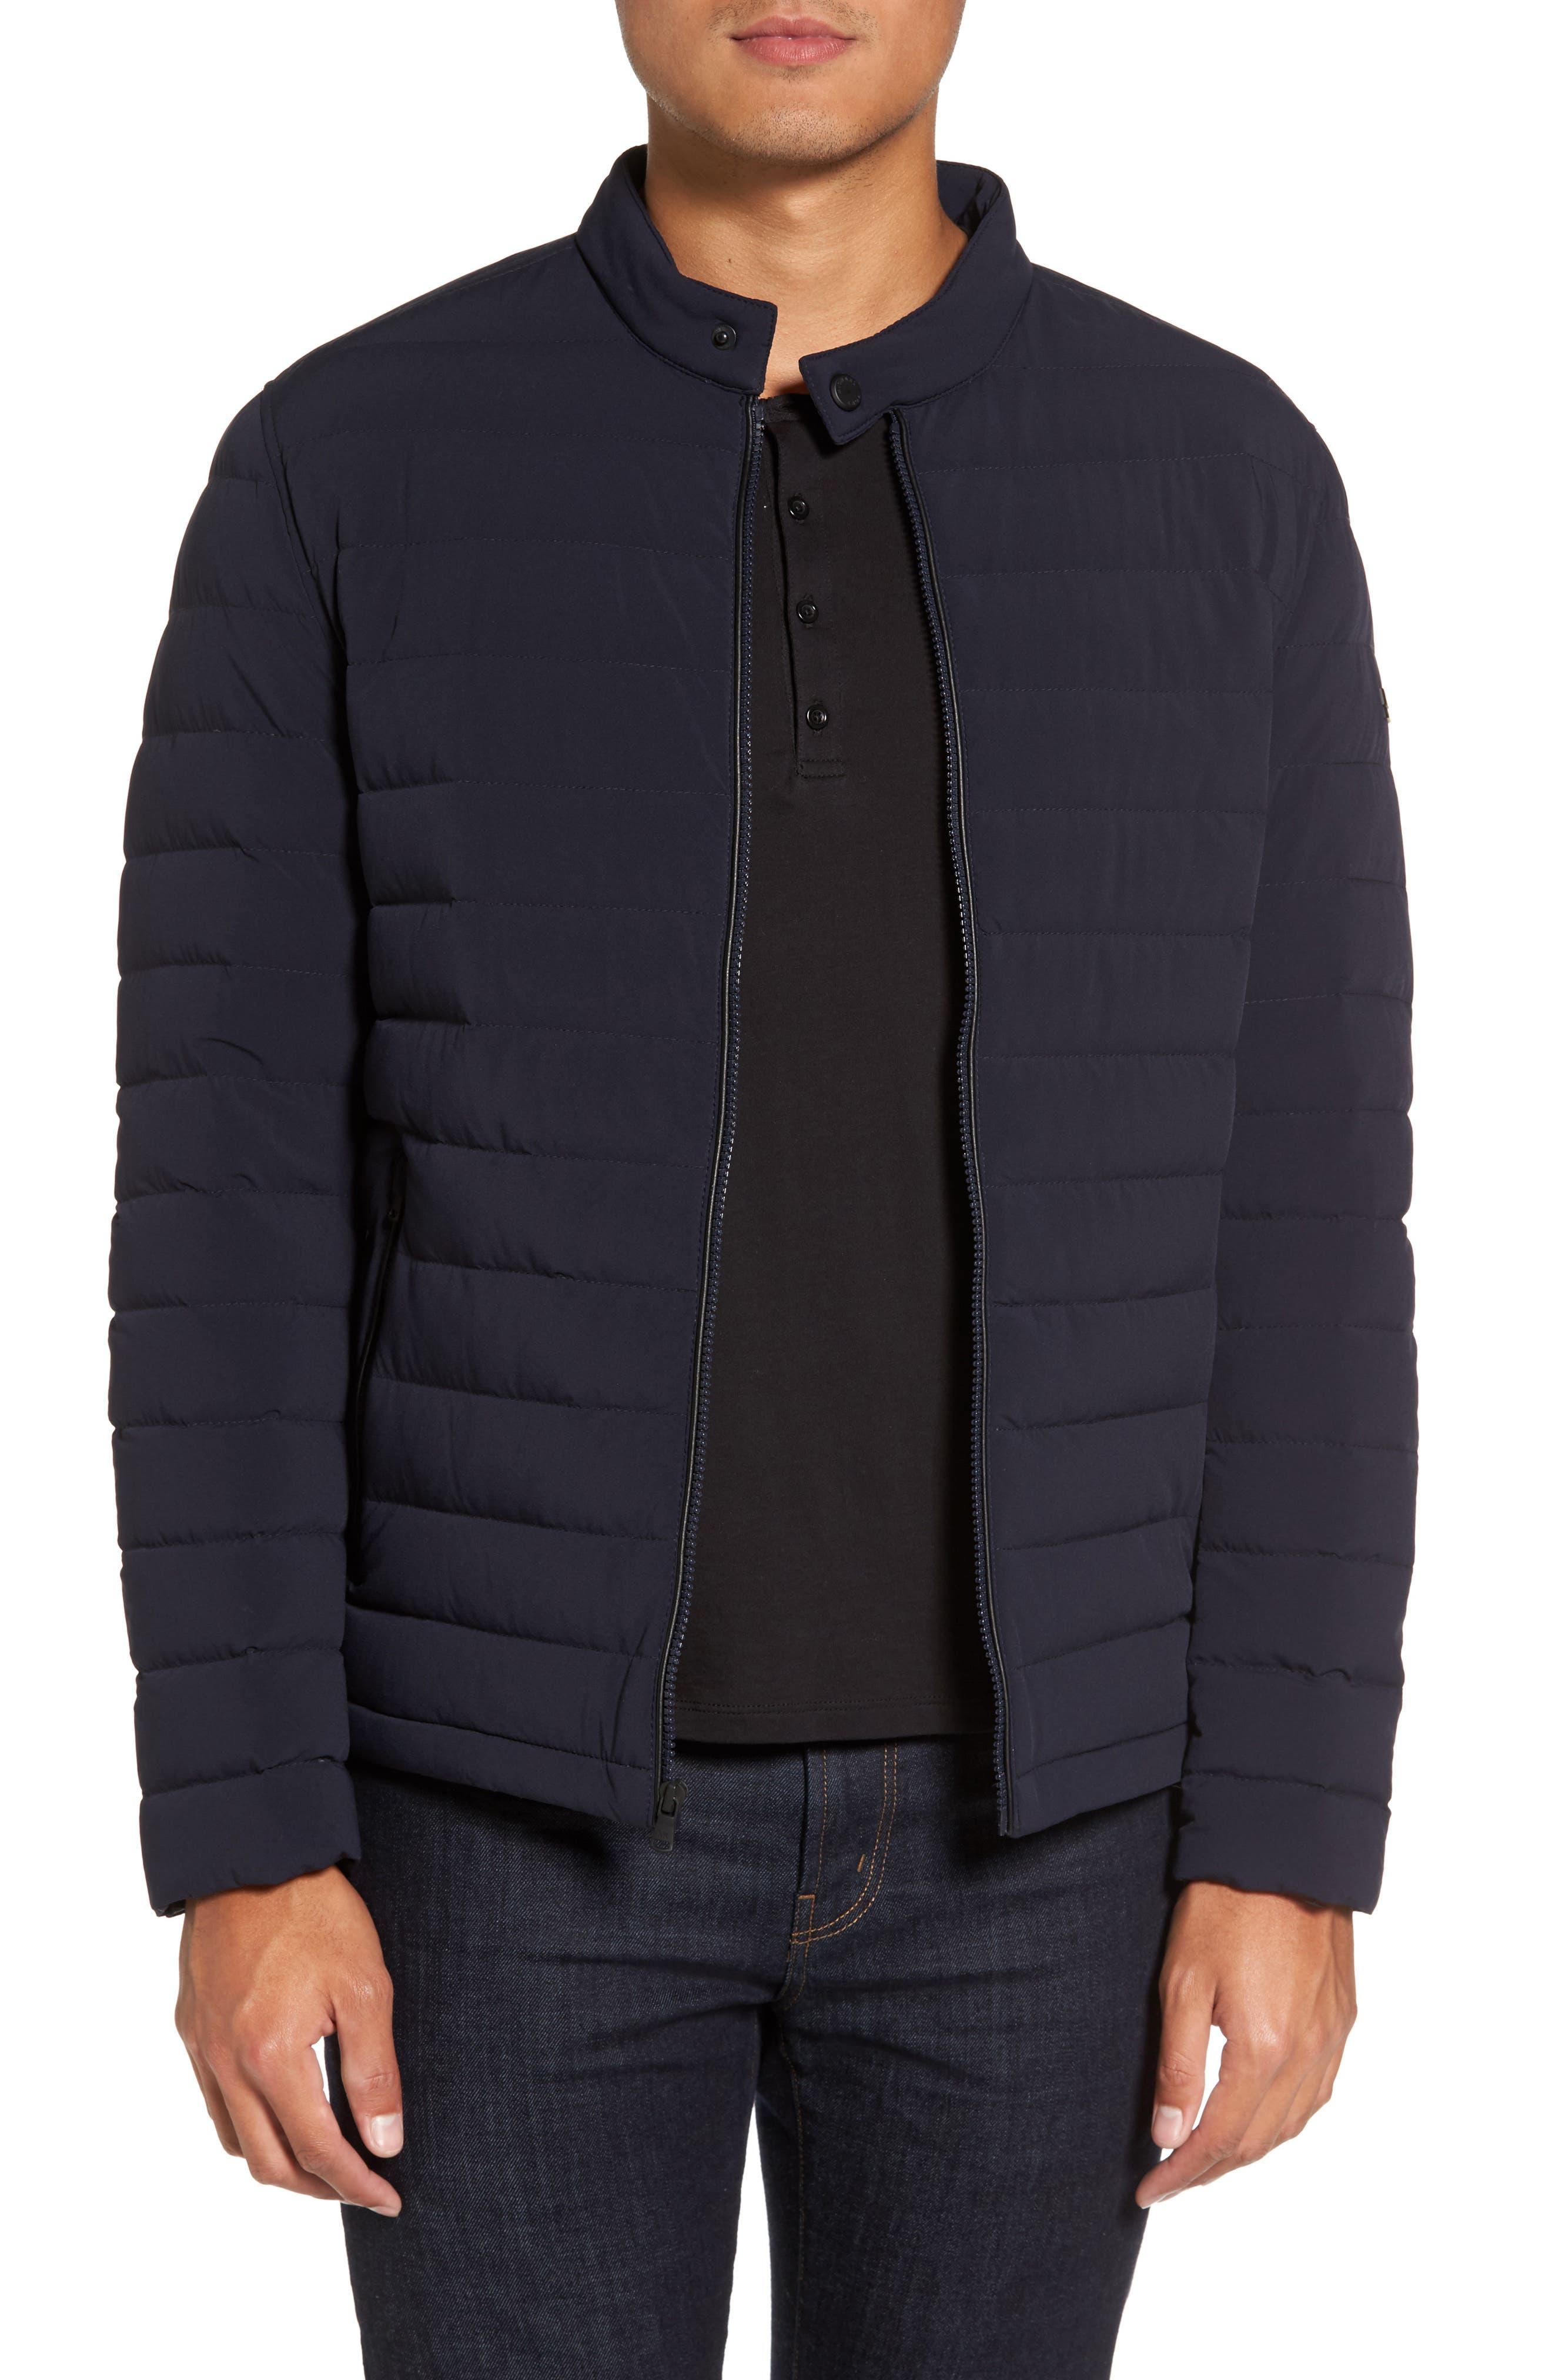 Michael Kors Packable Stretch Down Jacket